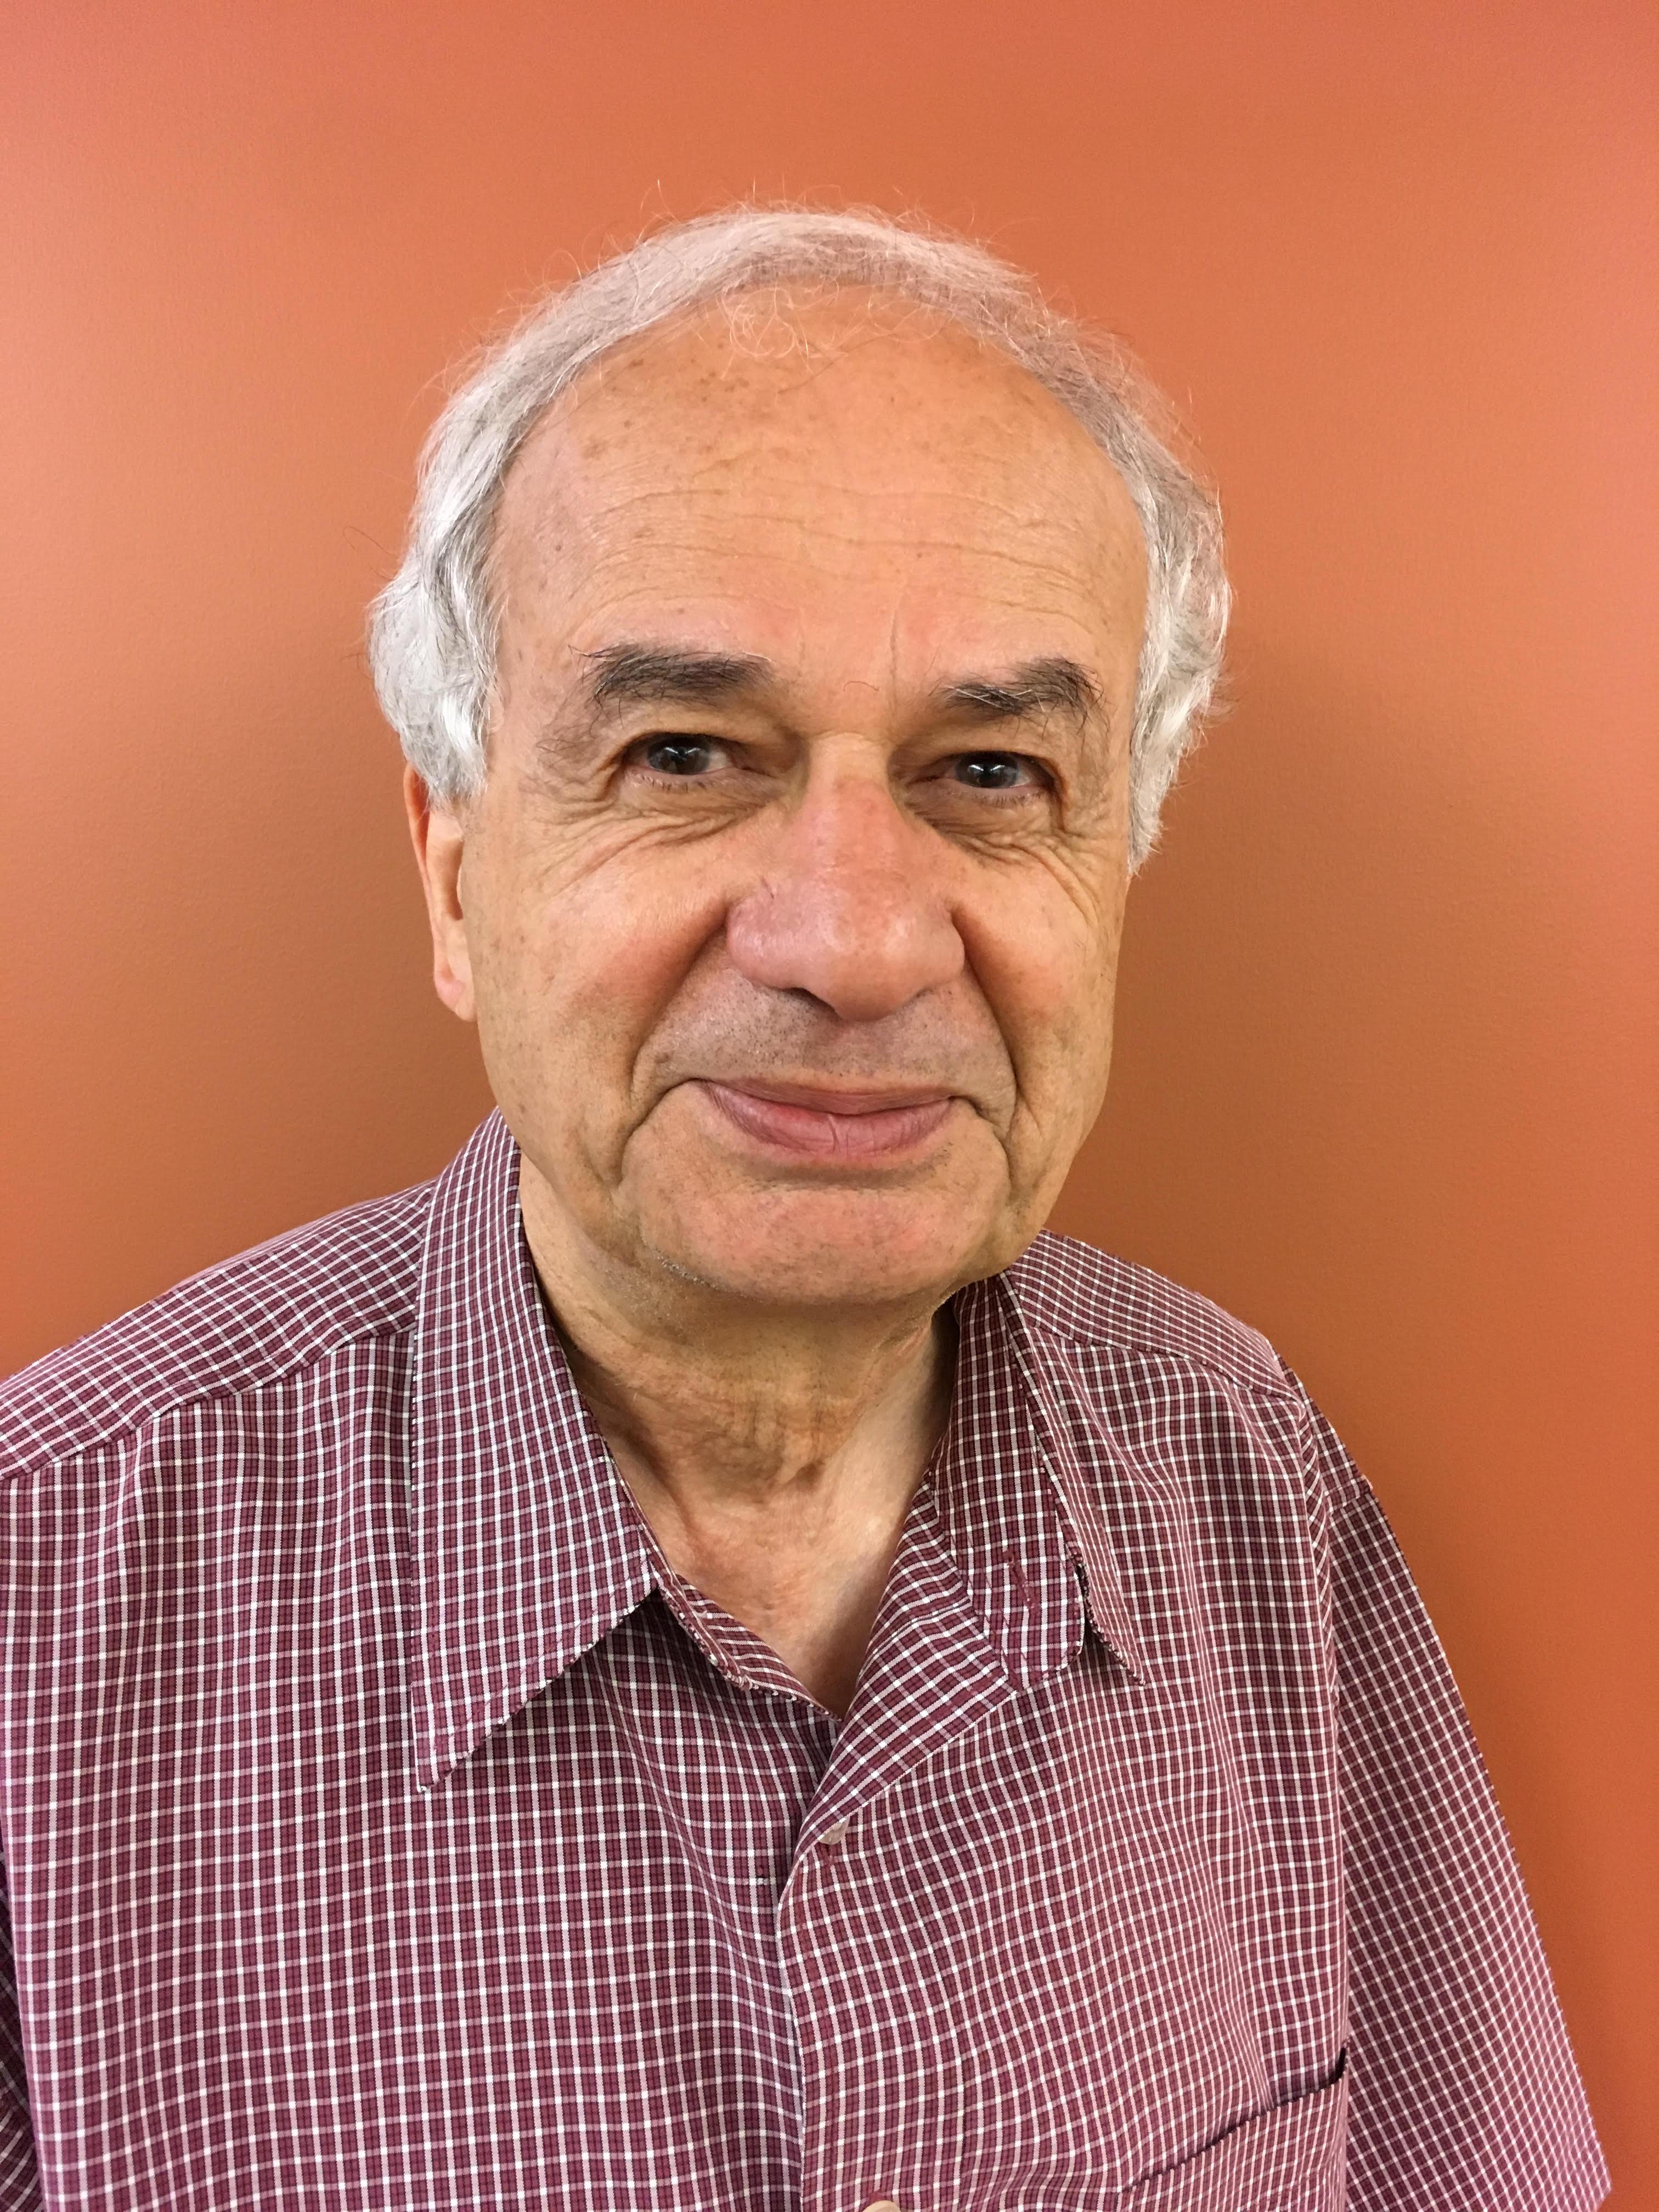 Meet Mohsen Nemat-Gorgani, PhD, member of the SGTC Team